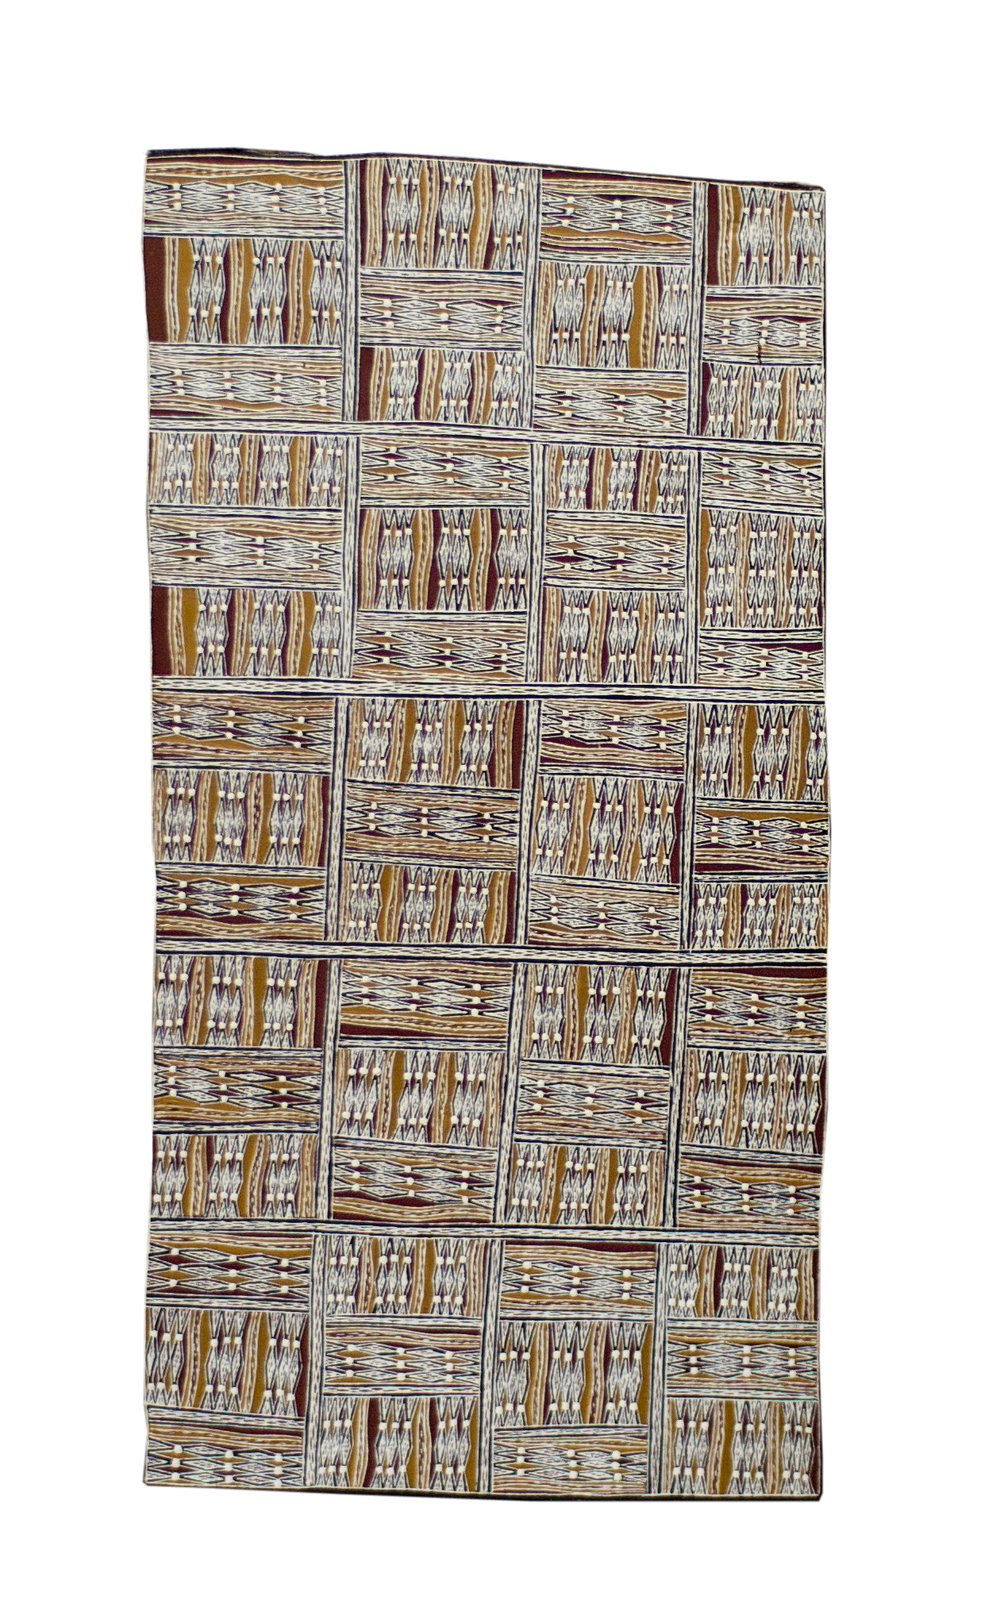 Rerrkirrwaŋa Munuŋgurr   Untitled  Natural earth pigments on bark 56 x 23 cm  Buku Larrnggay Mulka #4096H   EMAIL INQUIRY